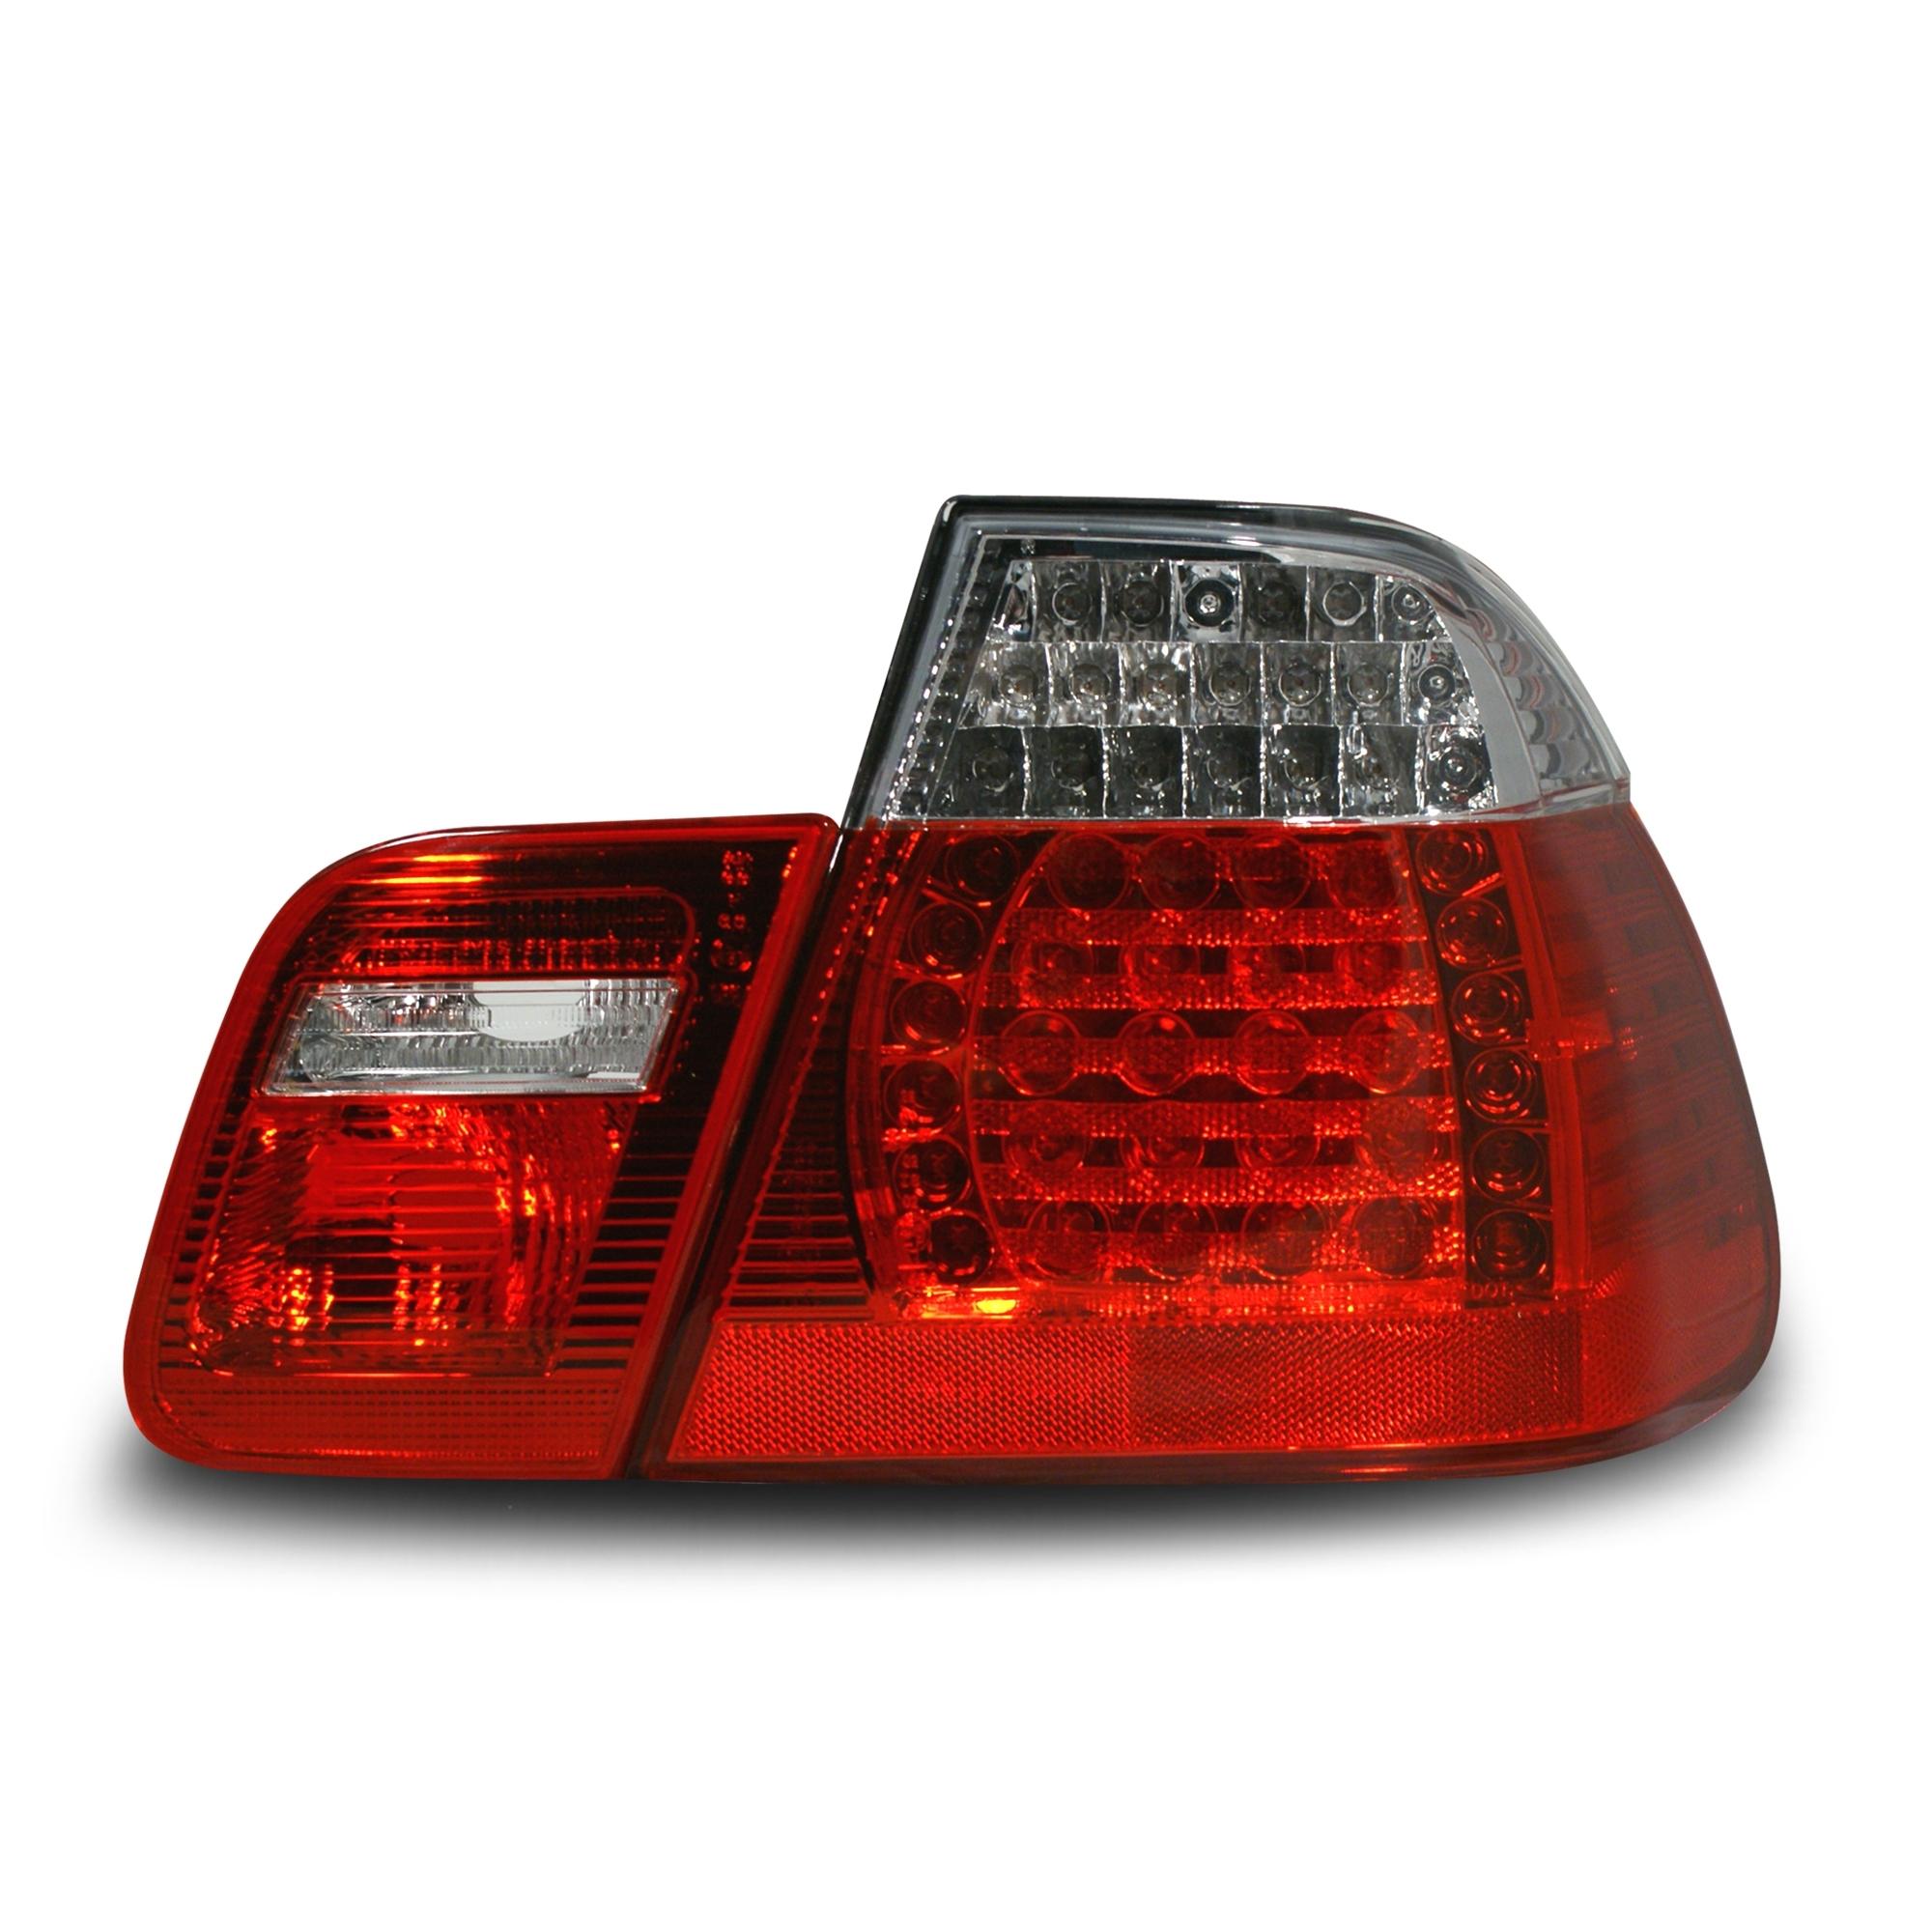 feux arri re led bmw e46 4 verre lisse rouge clair 4 pi ces. Black Bedroom Furniture Sets. Home Design Ideas